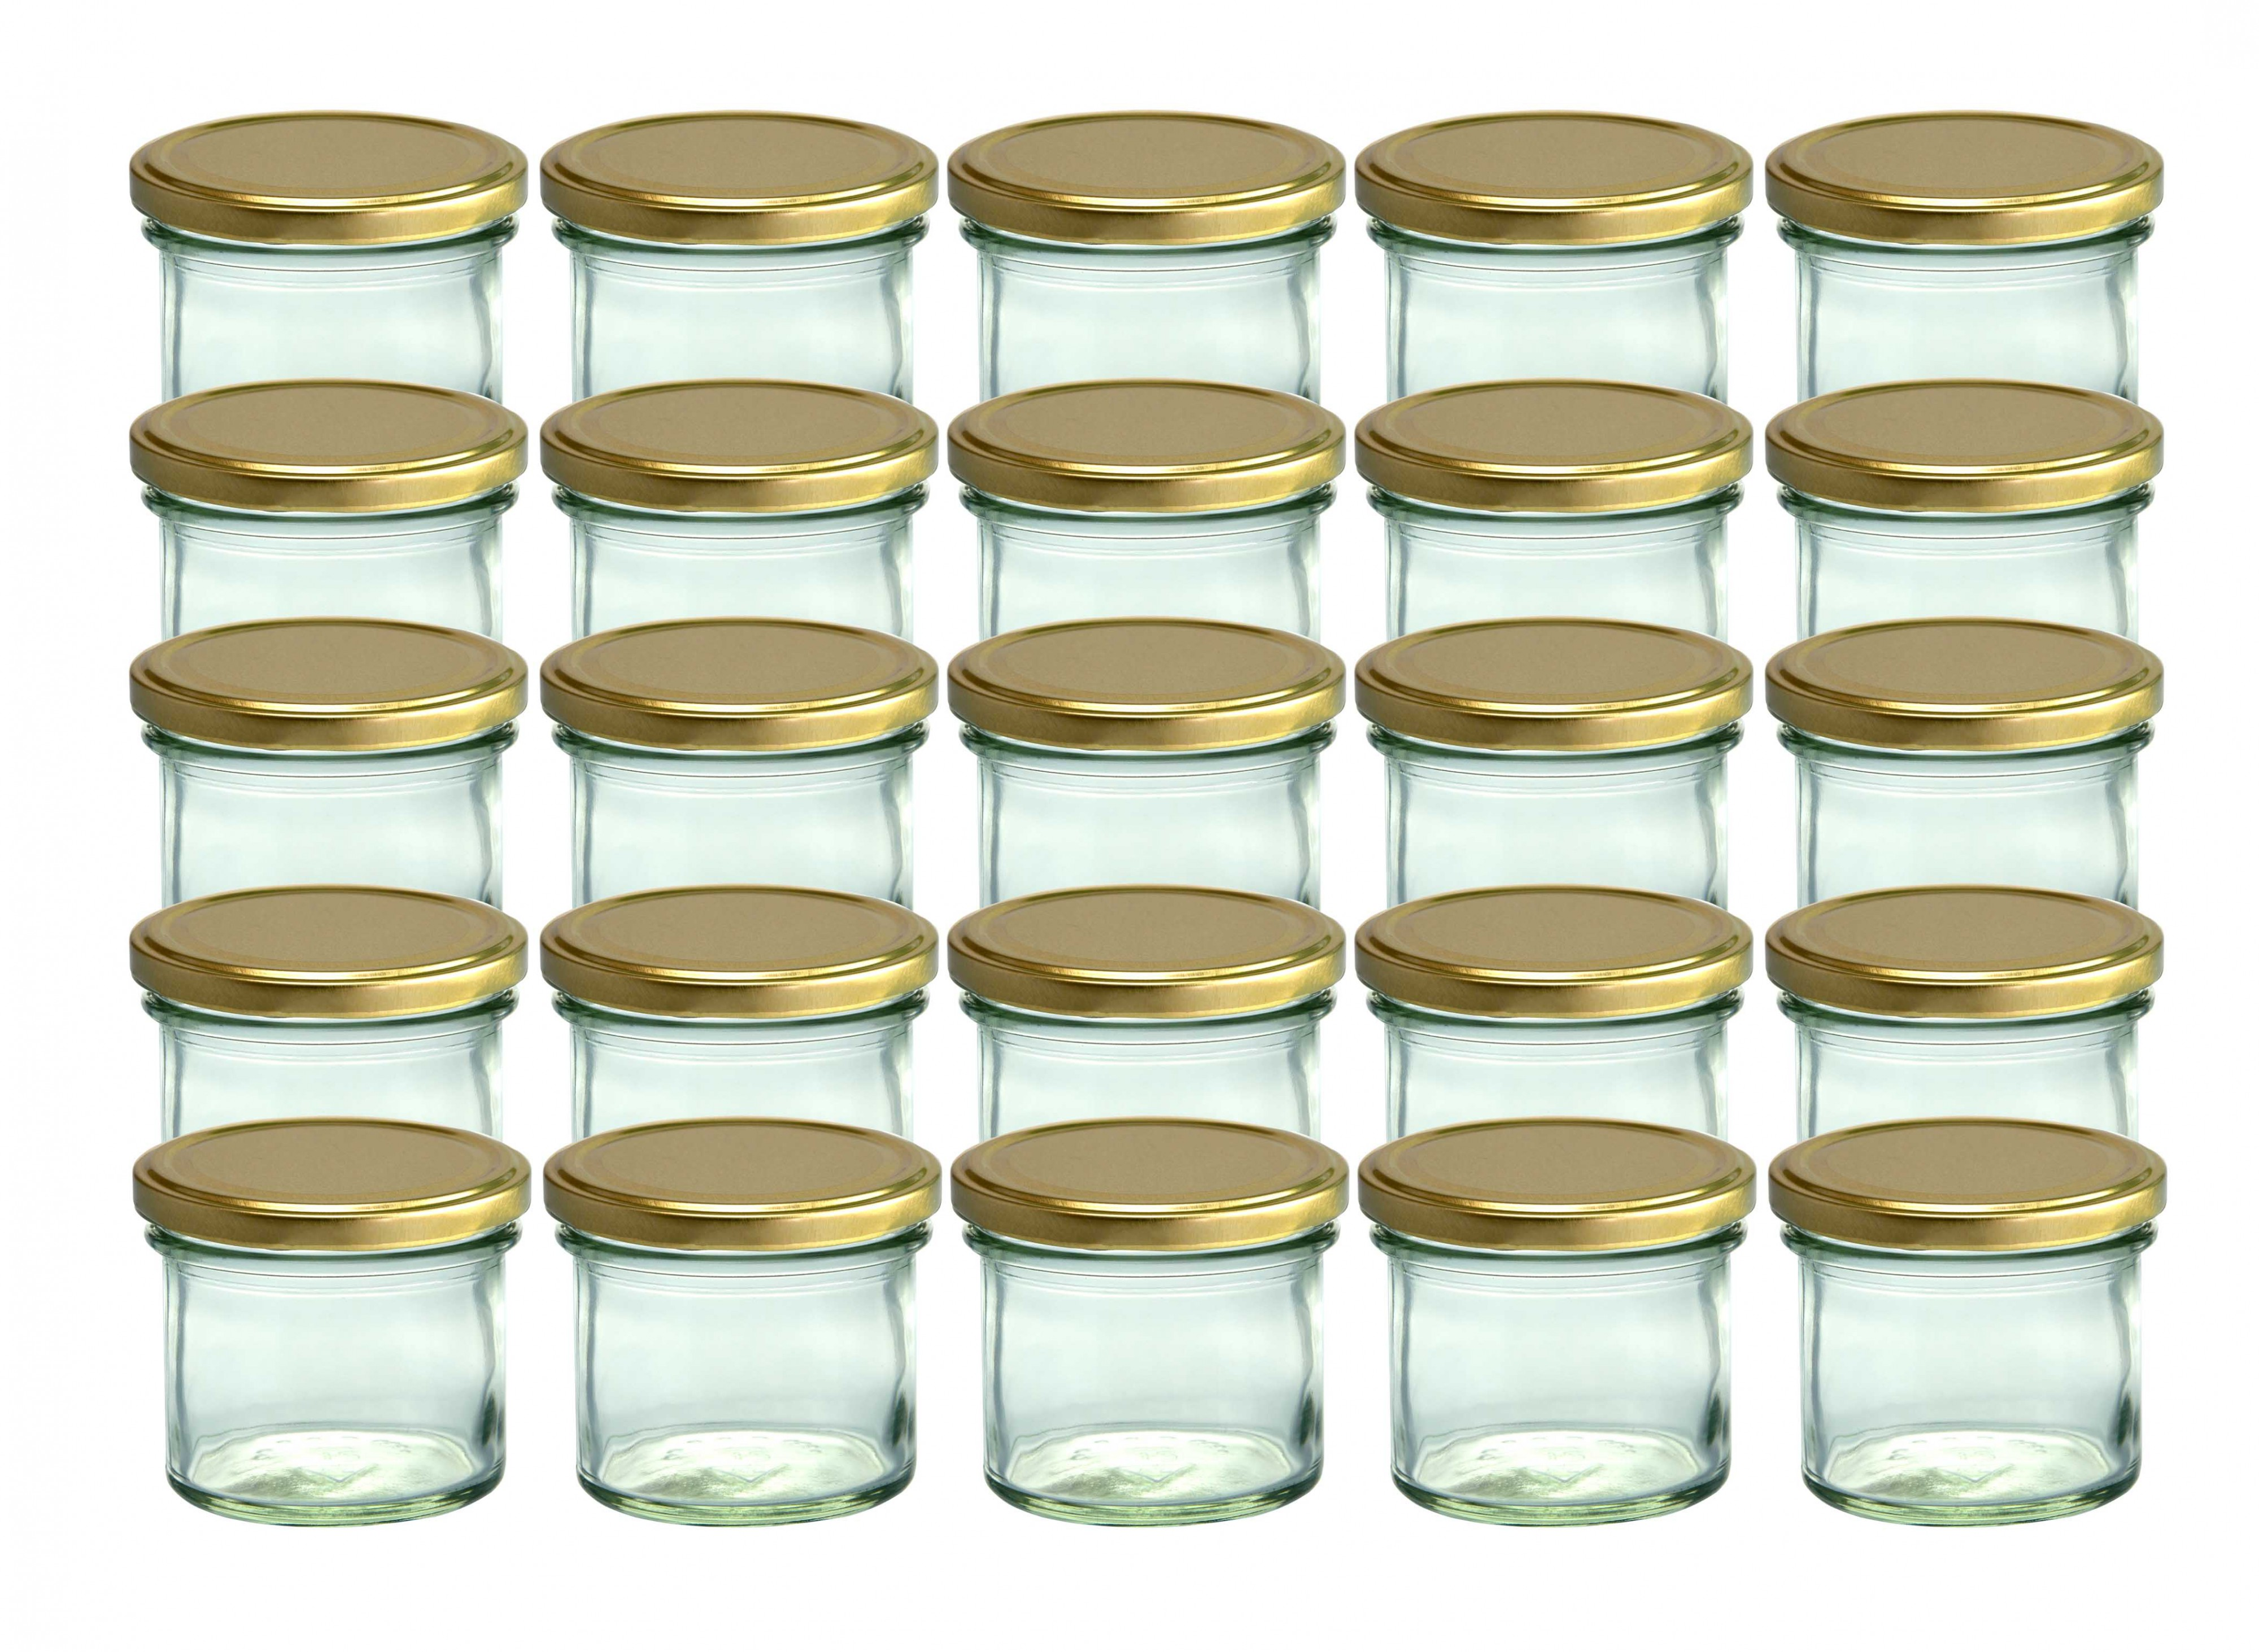 25 sturzgl ser 125 ml marmeladengl ser einmachgl ser. Black Bedroom Furniture Sets. Home Design Ideas